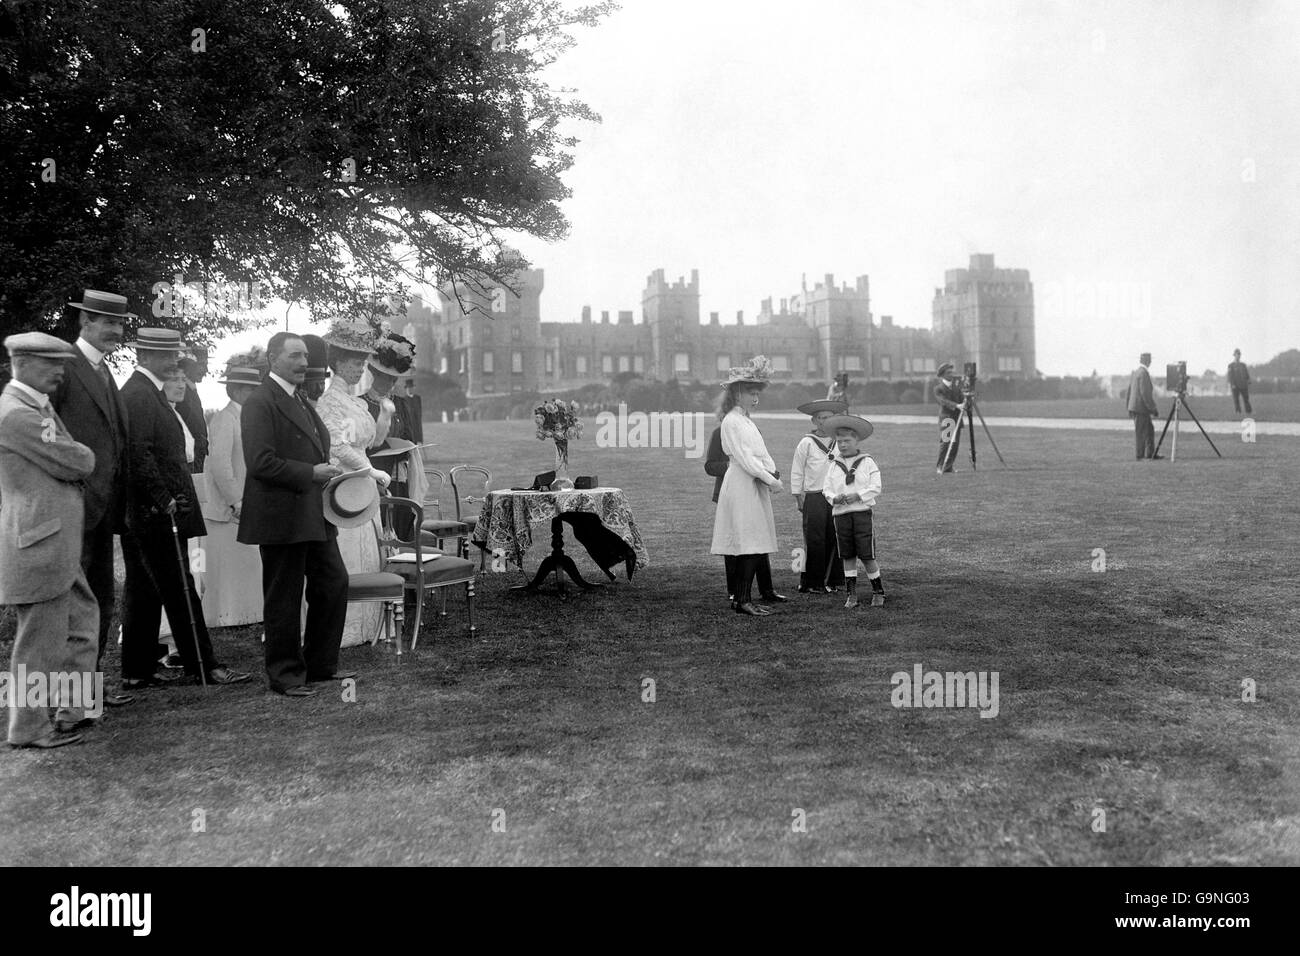 Athletics - London Olympic Games 1908 - Marathon - Stock Image